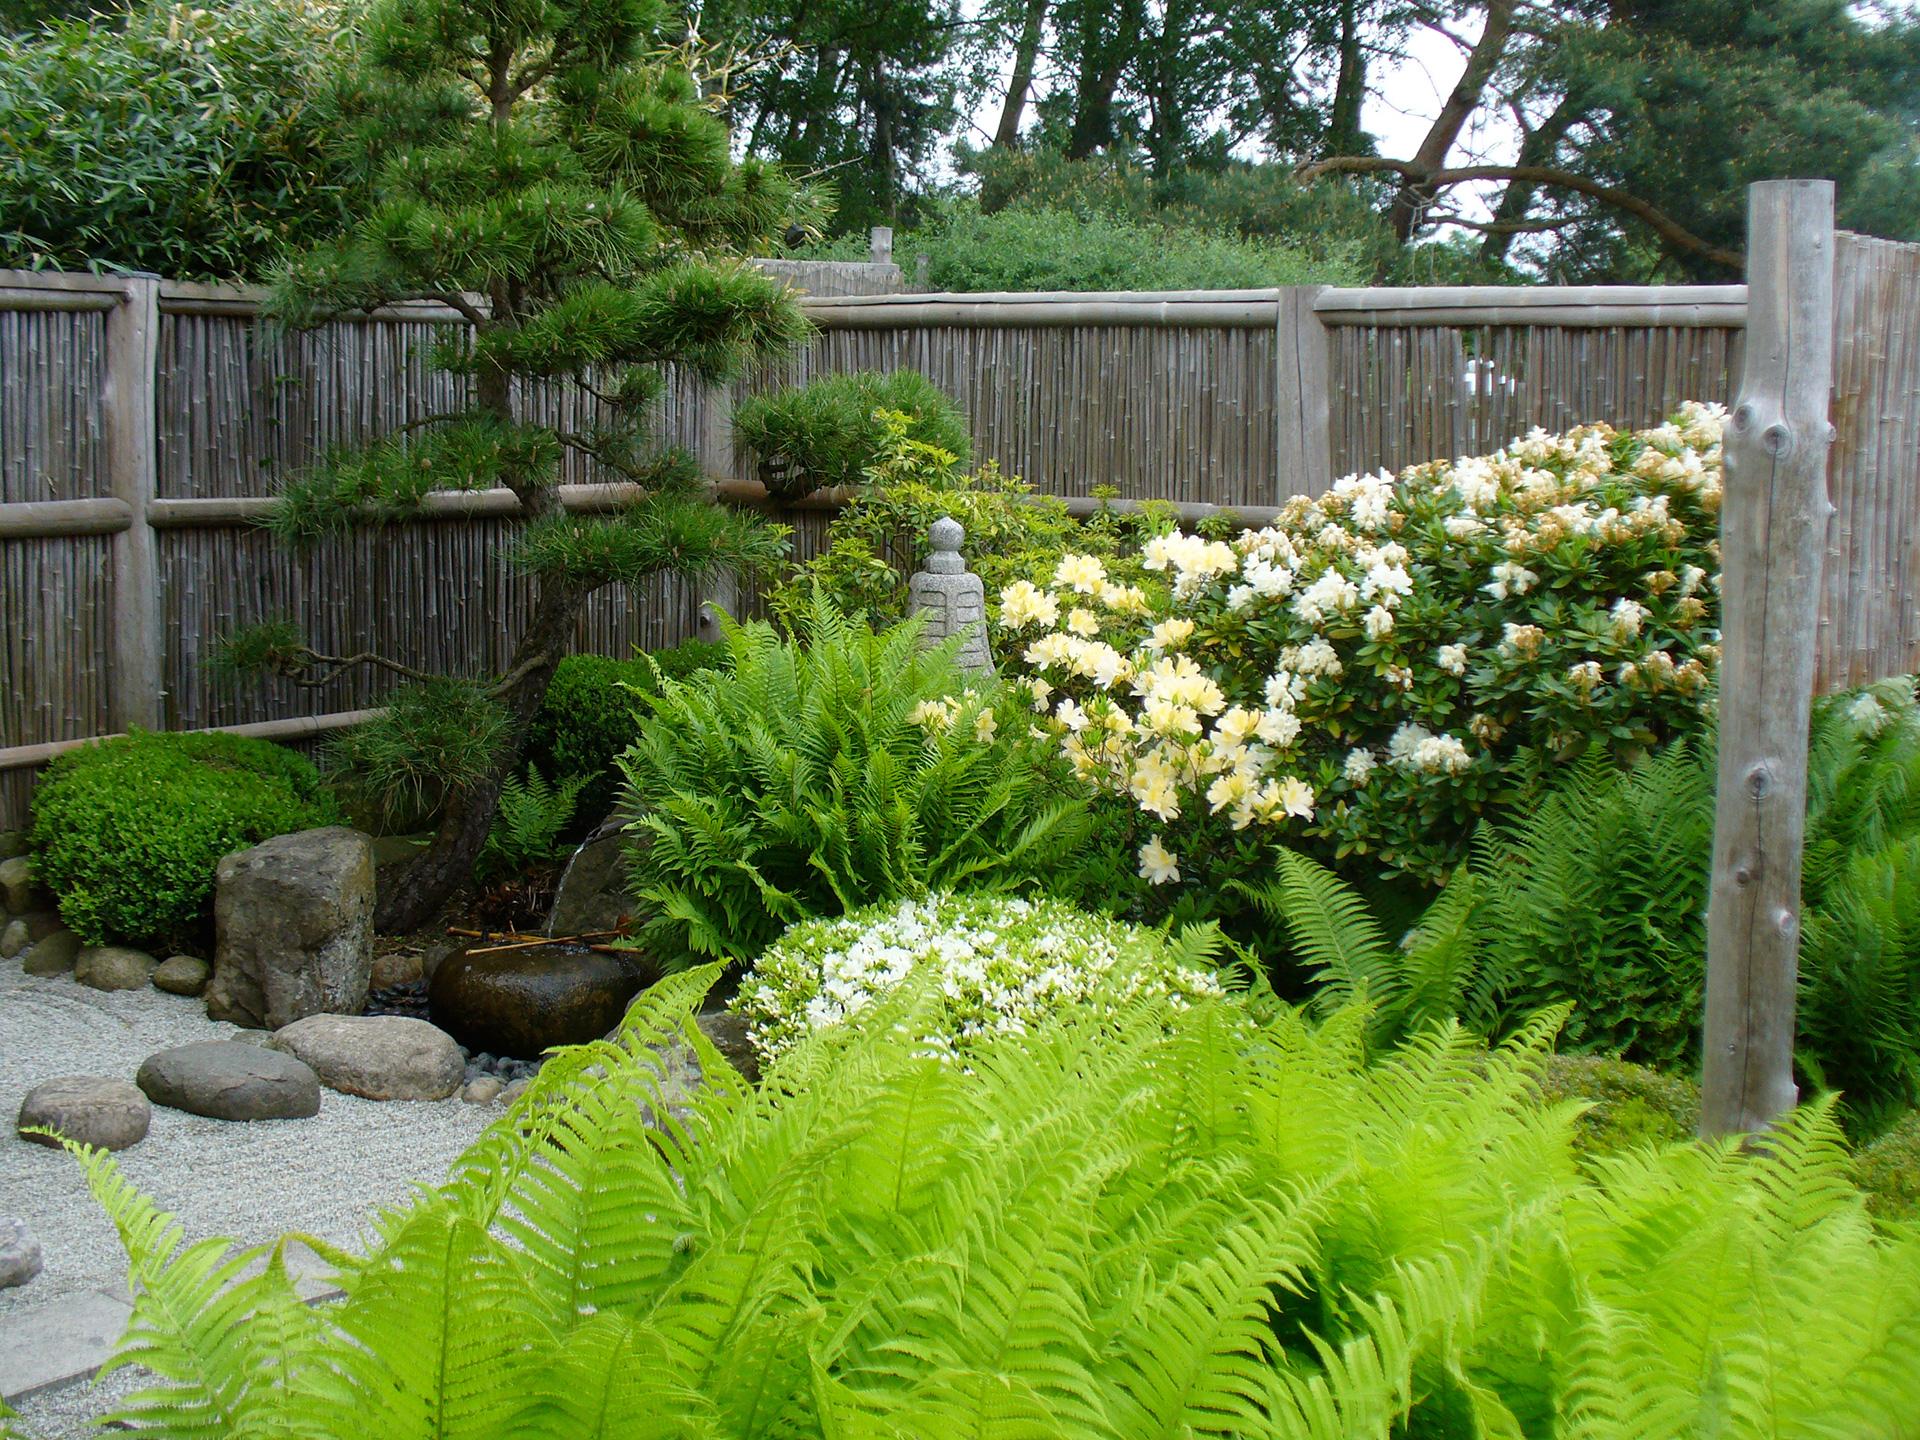 Top ROJI Japanische Gärten | Roji japanische Gärten, japanischer #FV_31